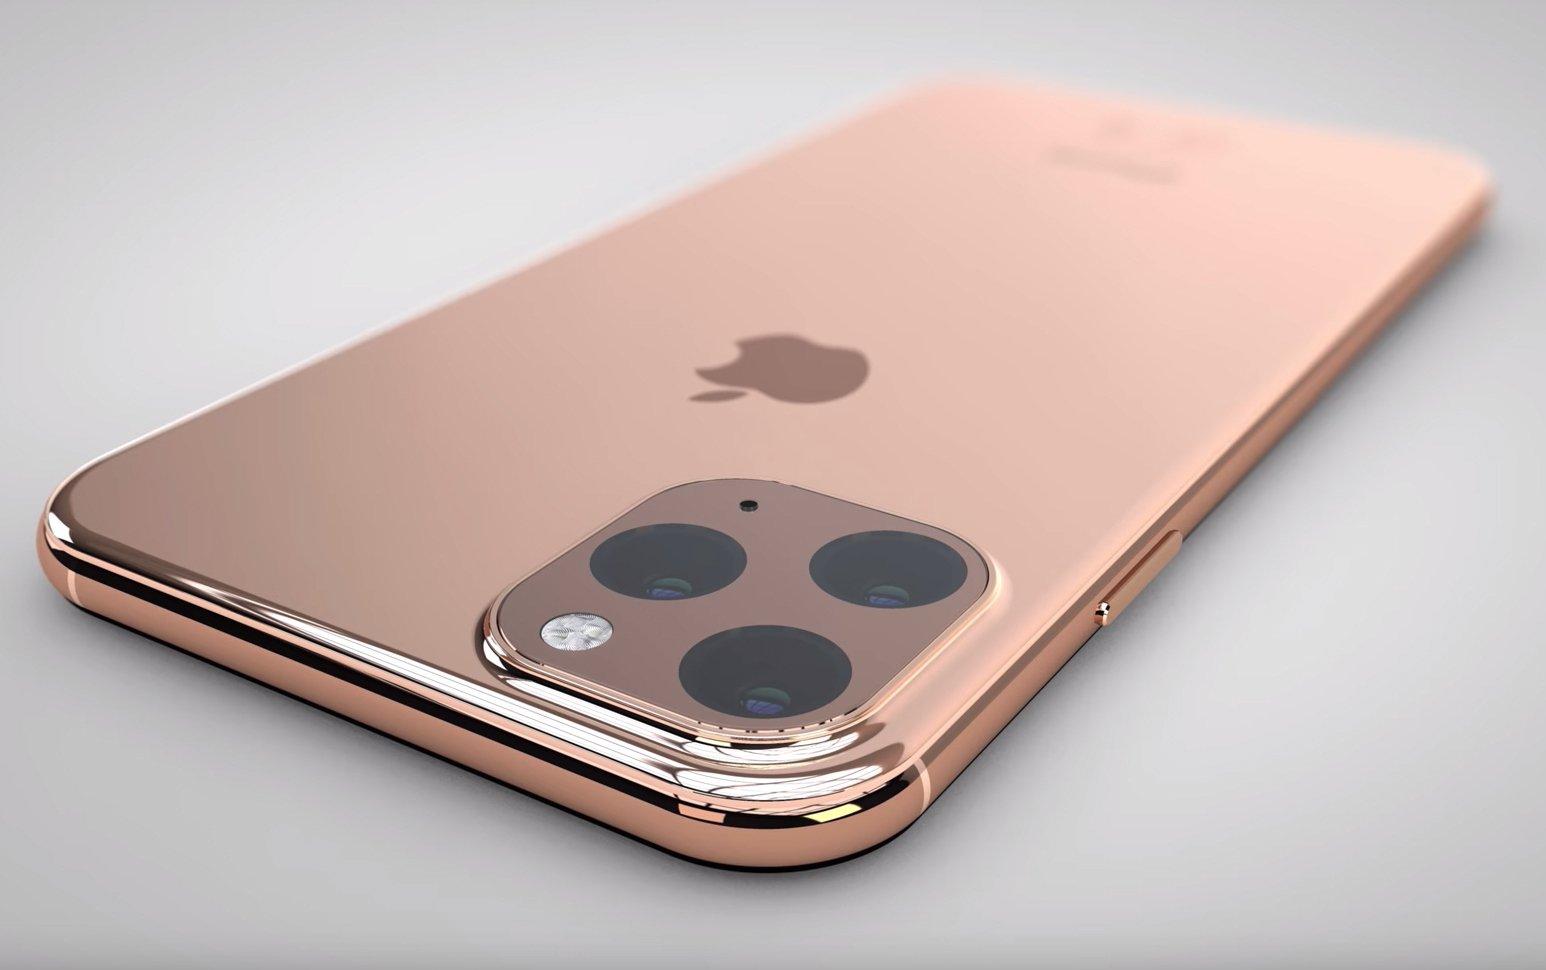 Apple iPhone 11 cene in verzije iPhone 11 iPhone 11 Pro in iPhone 11 Pro Max